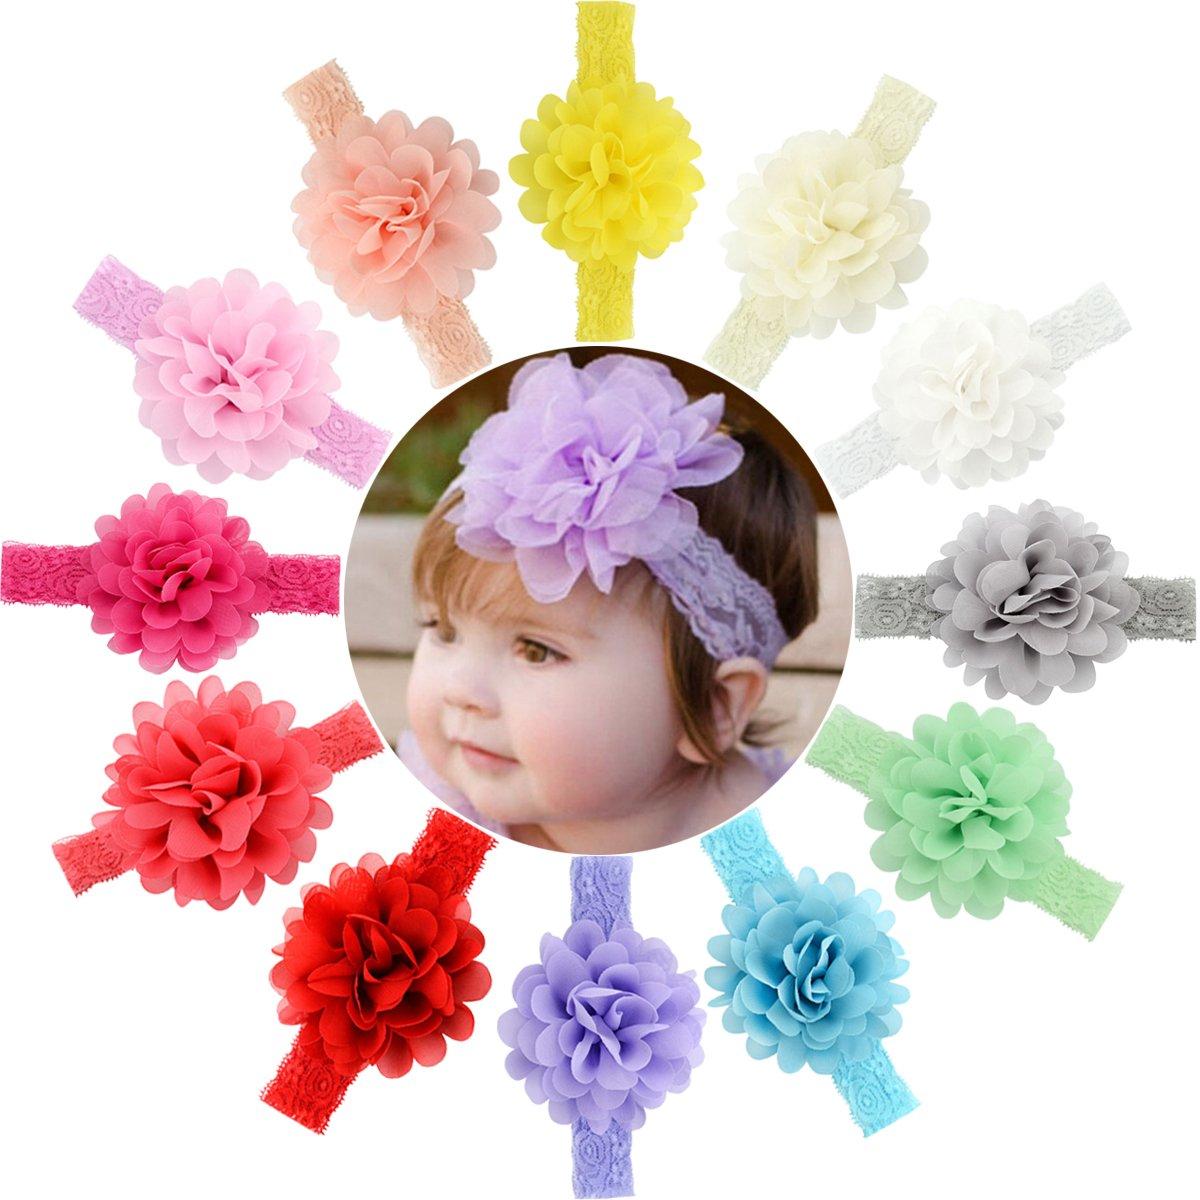 Amazon.com: Baby Girls Headbands Grosgrain Ribbon 4.5 ...